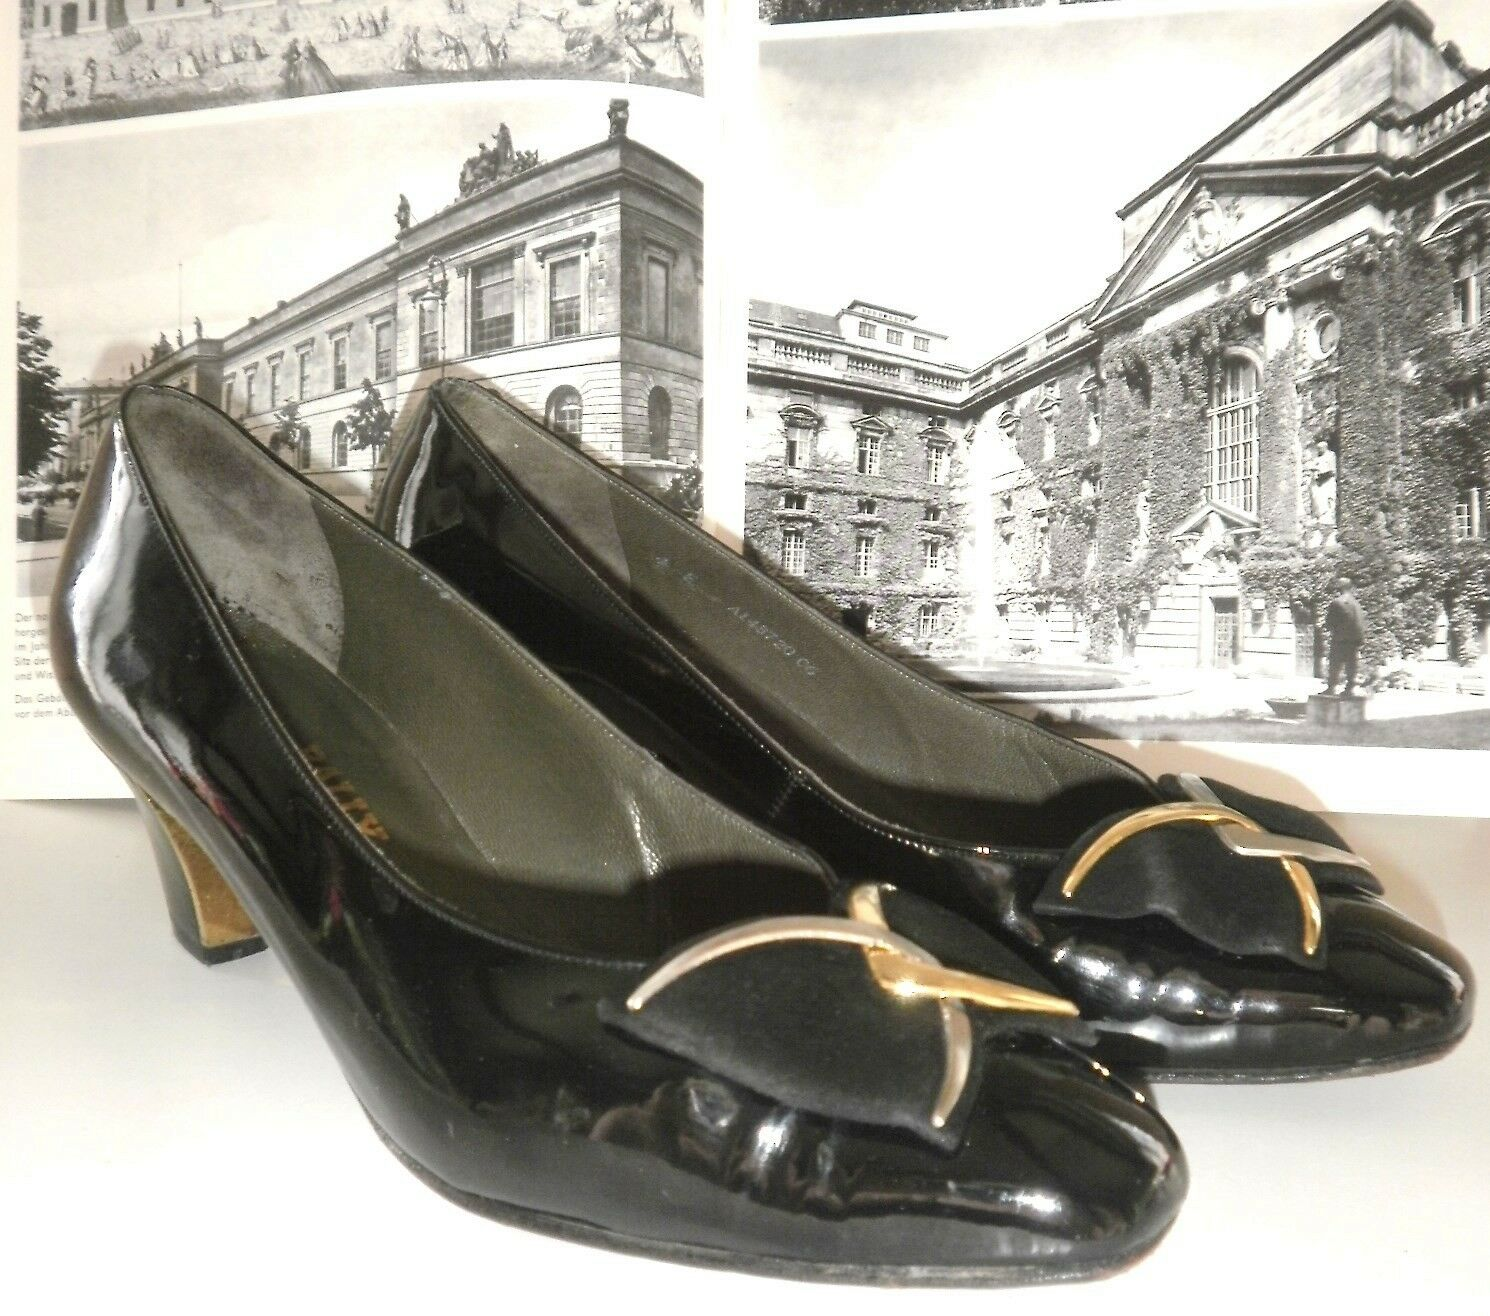 BALLY Damen Pumps SABLON made switzerland TRUE VINTAGE Schuhe Lackschuhe N5007